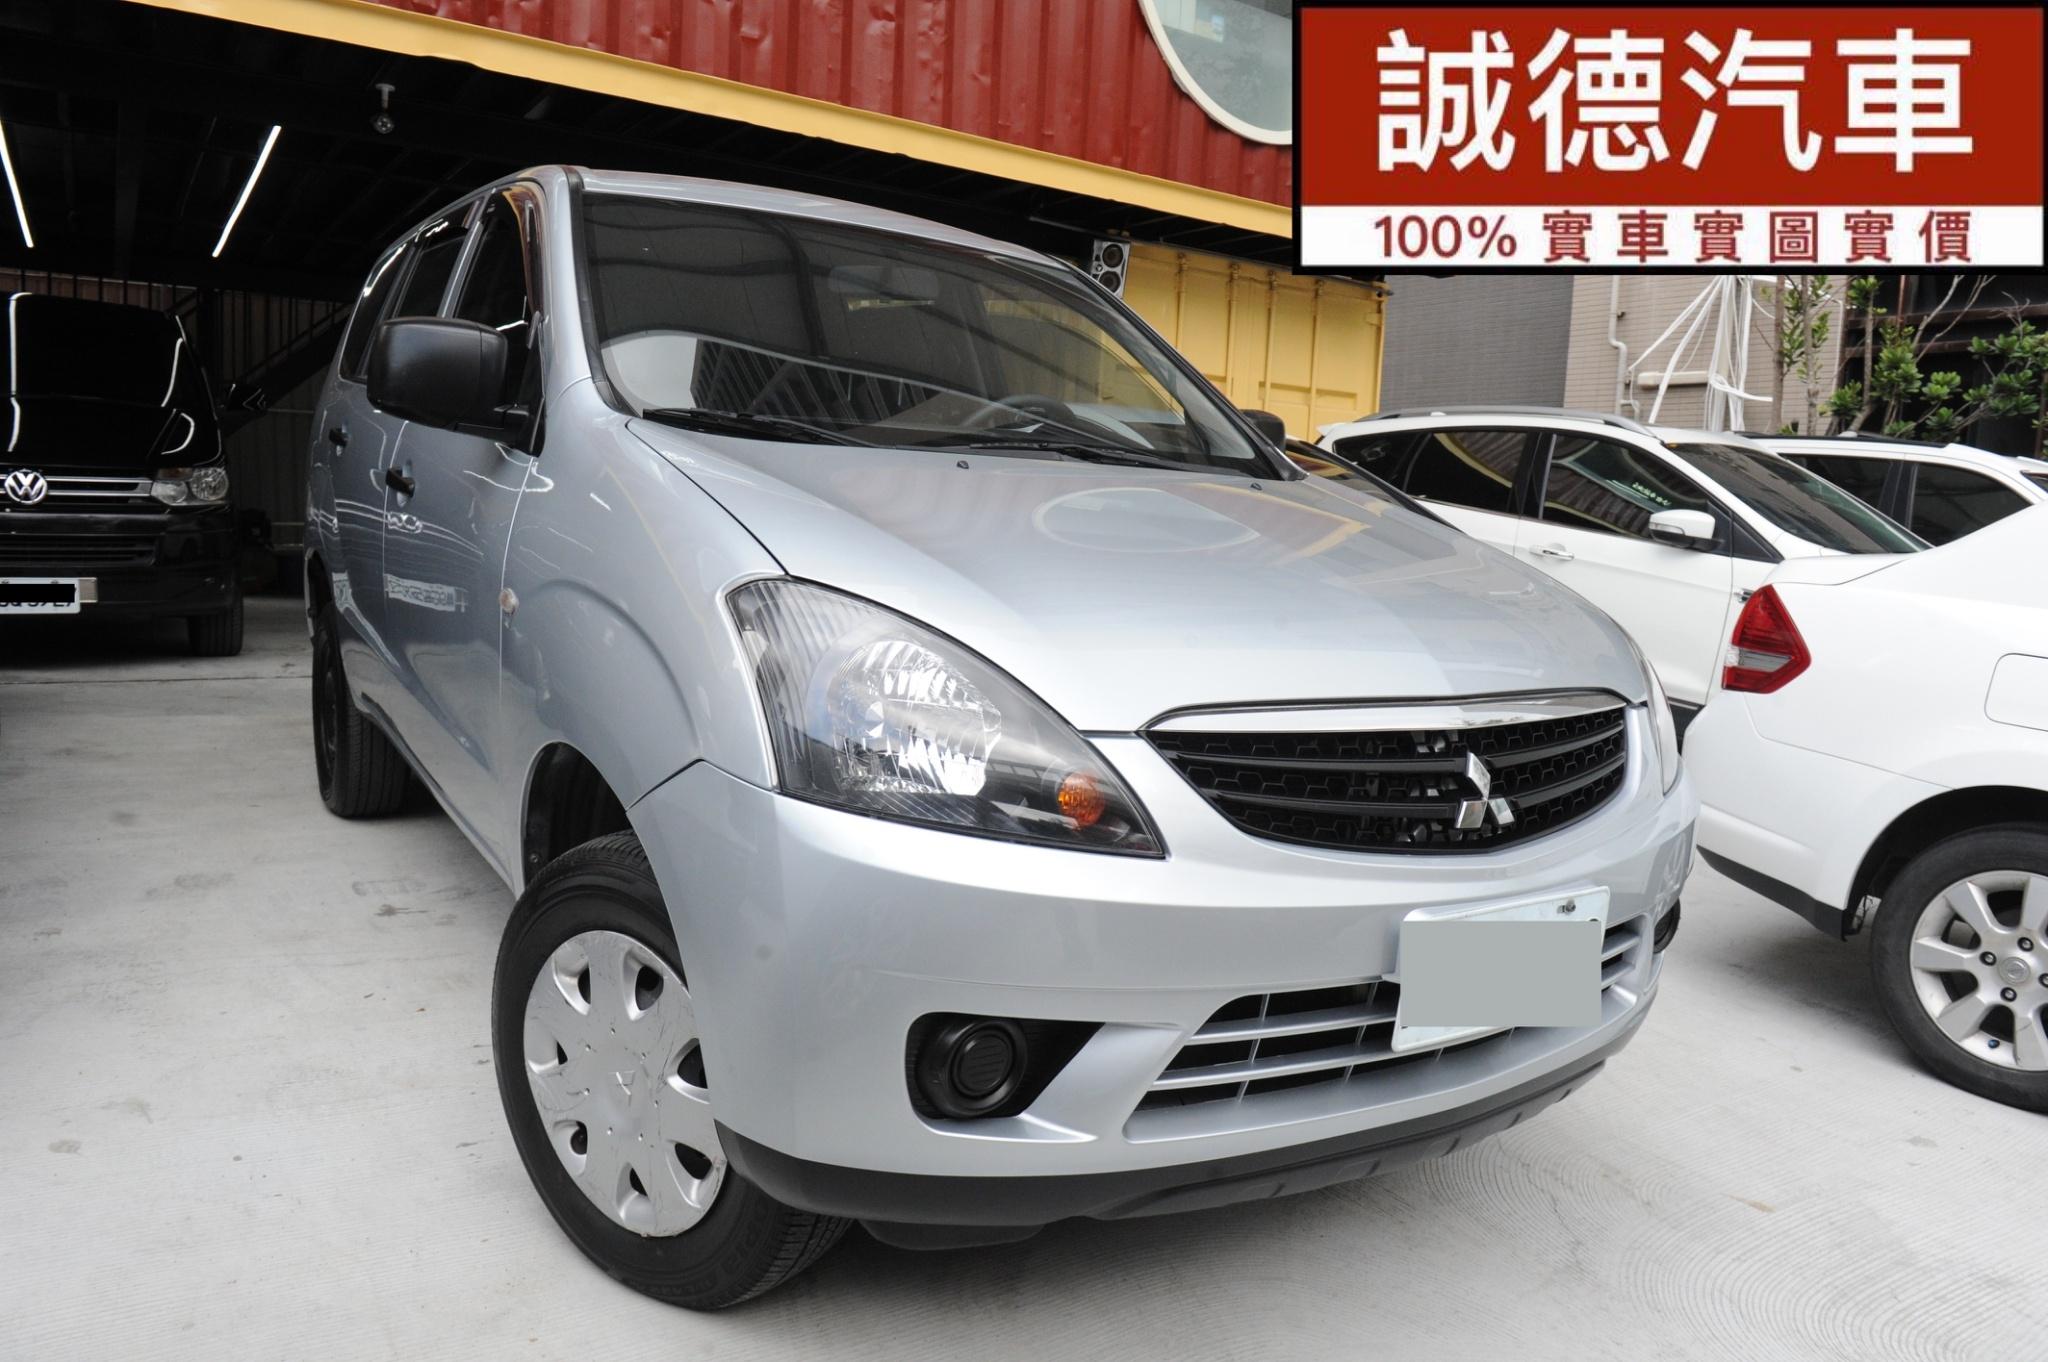 2013 Mitsubishi 三菱 Zinger